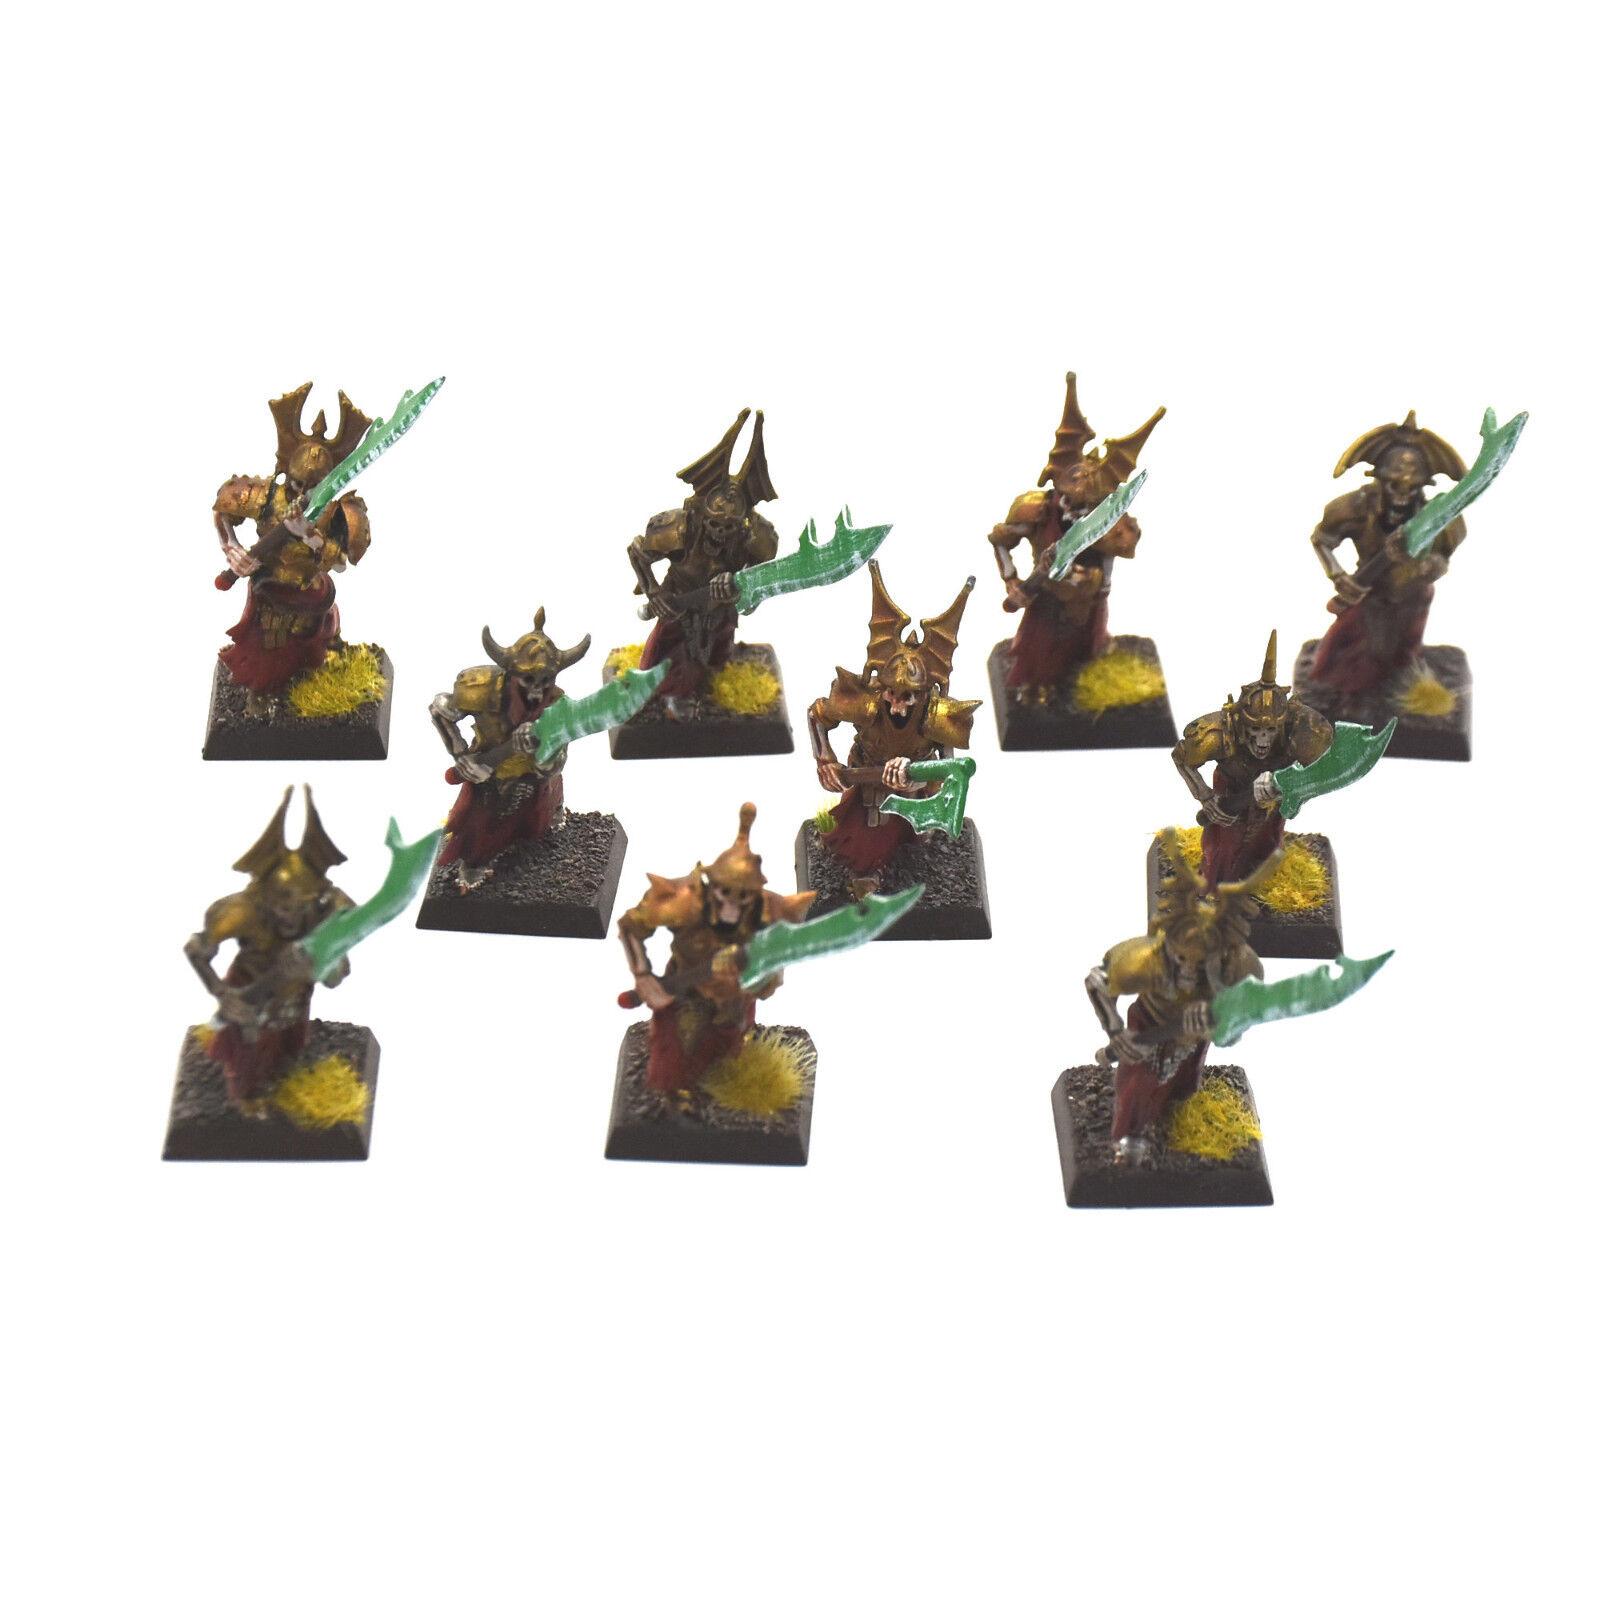 VAMPIRE COUNTS 10 Grave Guards PRO PAINTED Warhammer Fantasy Fantasy Fantasy Death guard 7c2fa7